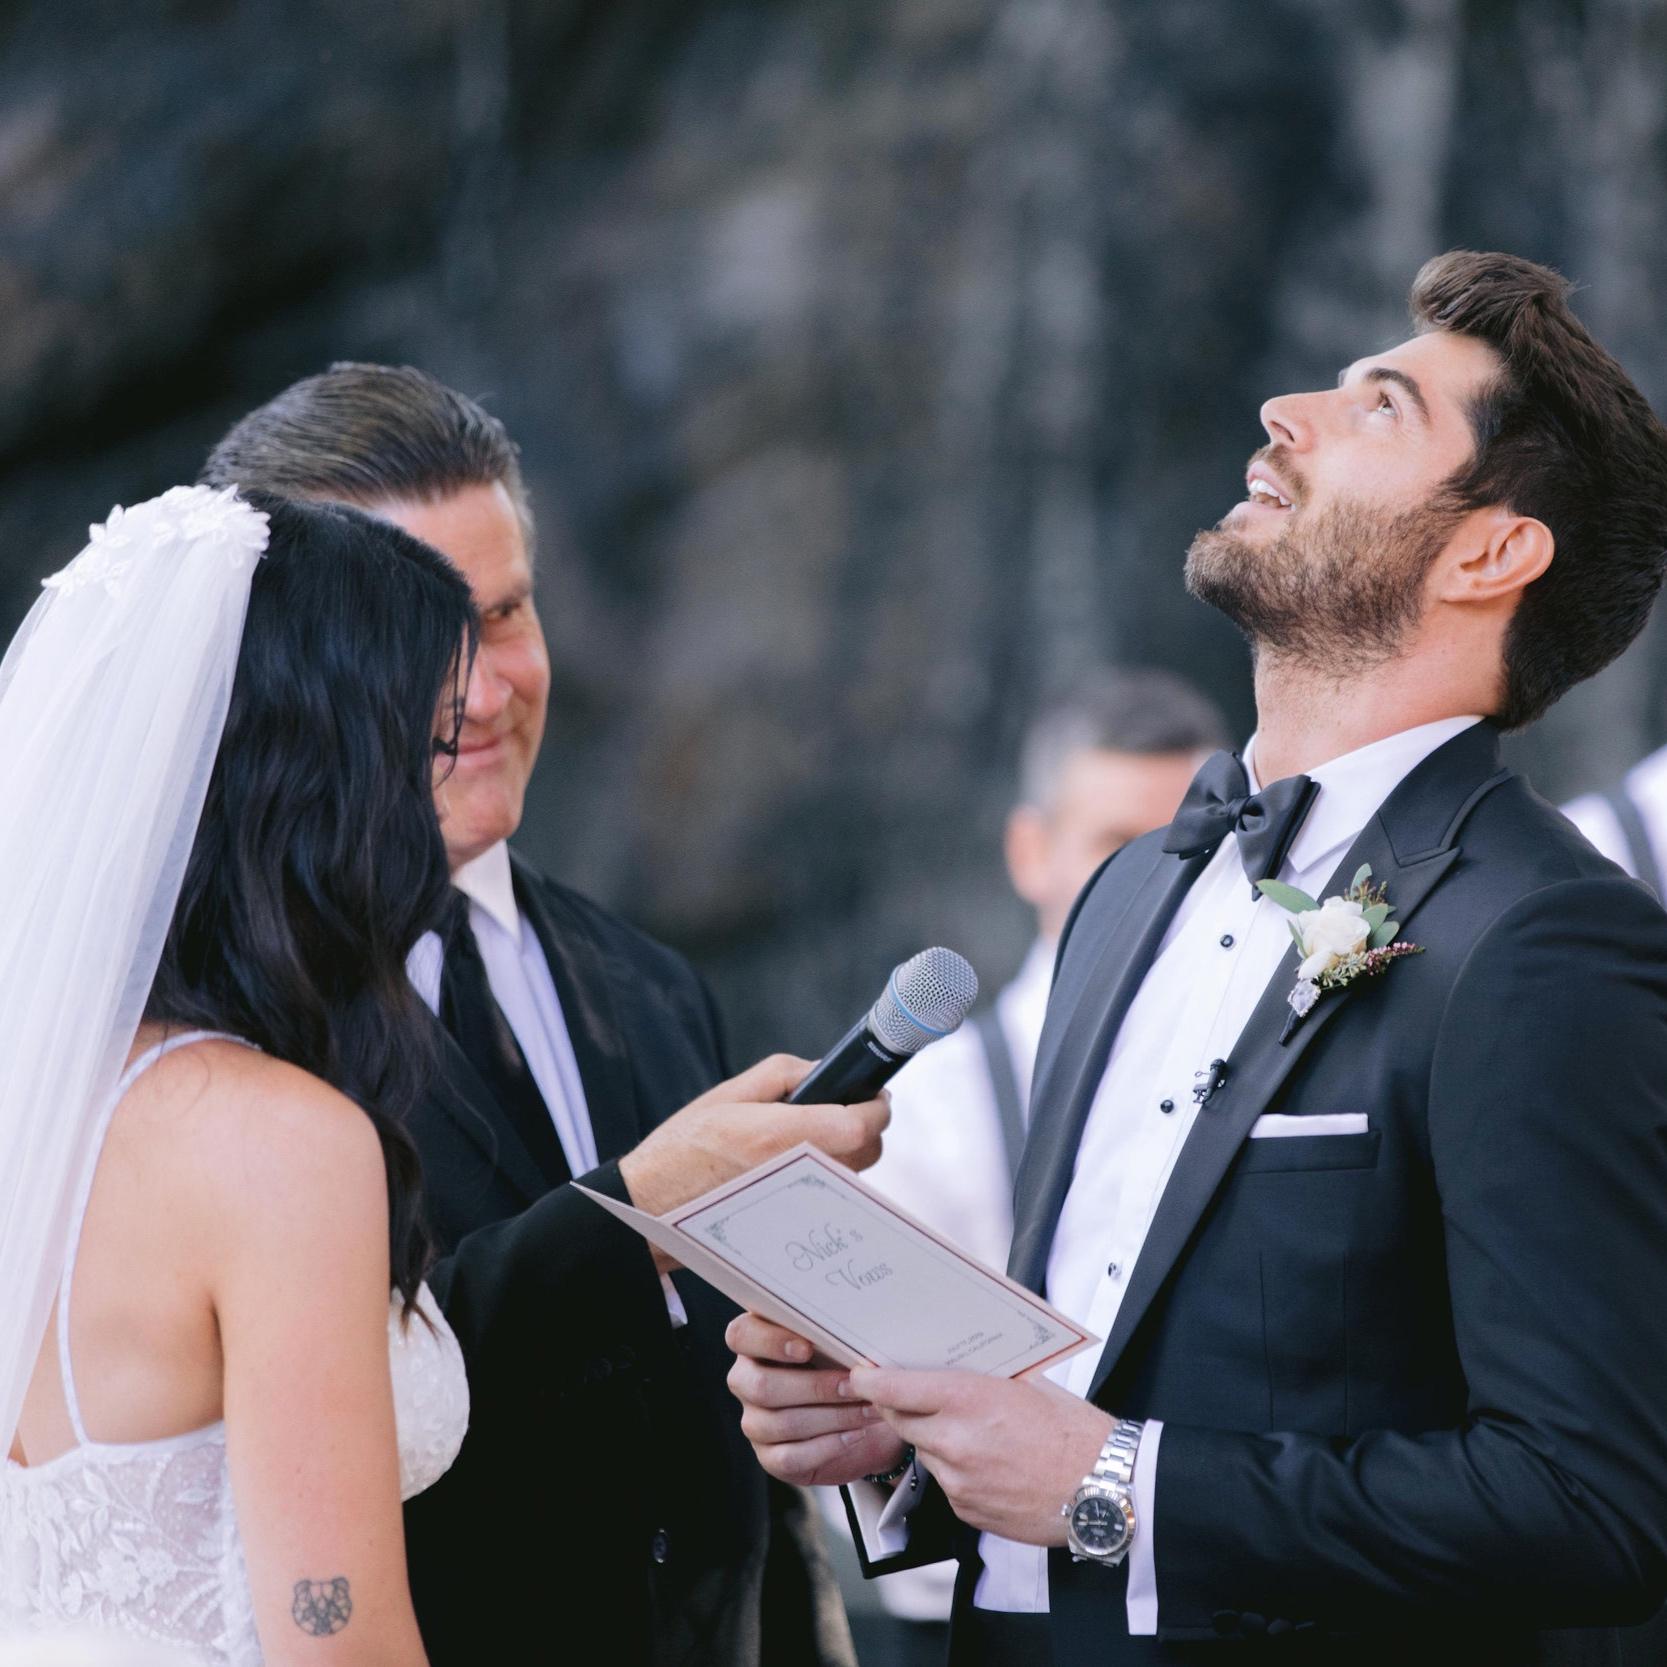 Nick choking up during his vows.